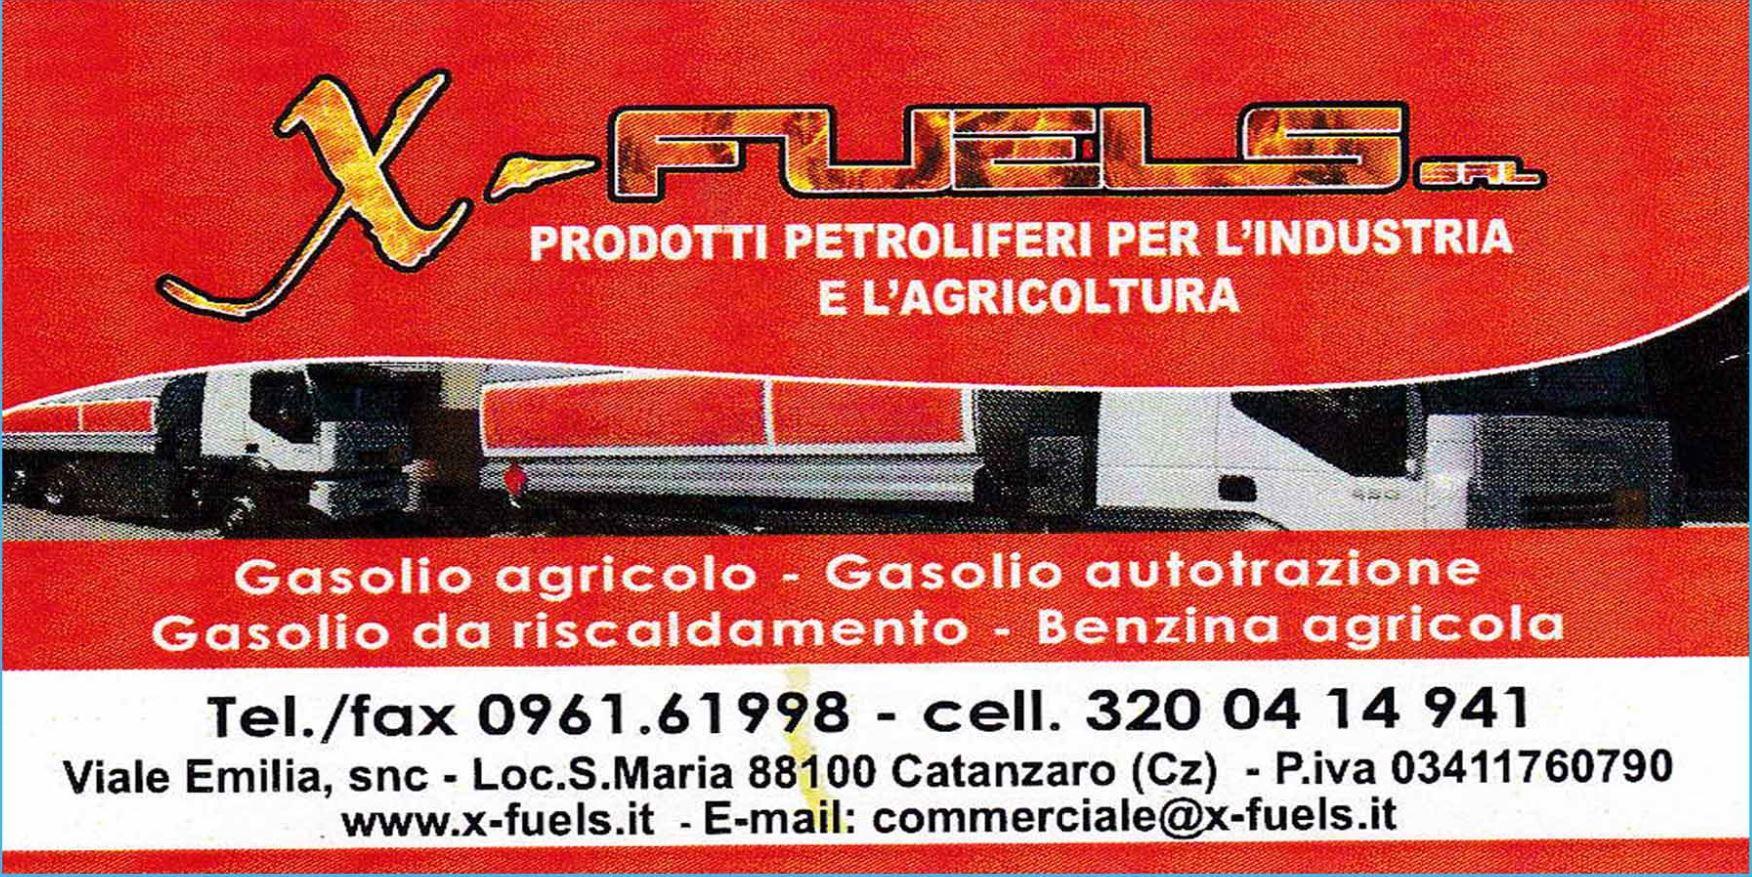 http://iniziativagimigliano.com/domain/wp-content/uploads/2018/07/XFuels.jpg